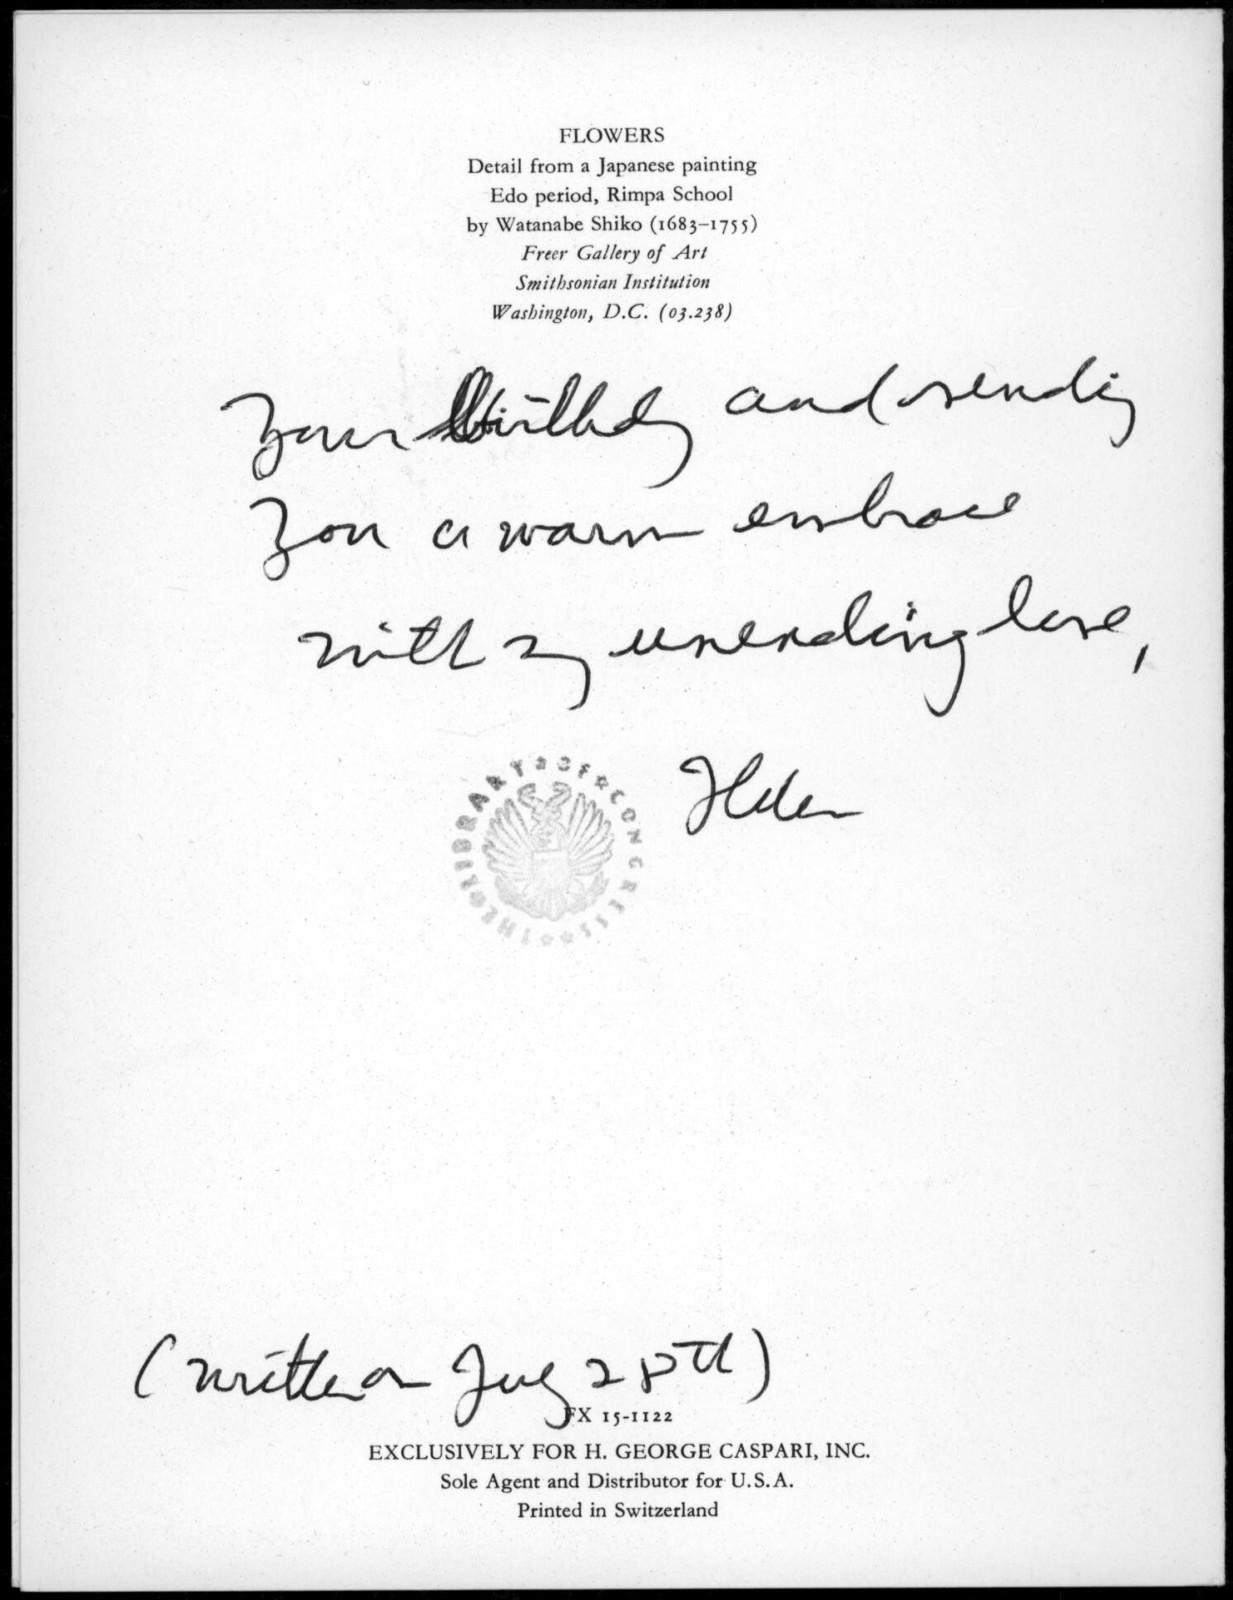 Letter from Helen Coates to Leonard Bernstein, n.d.